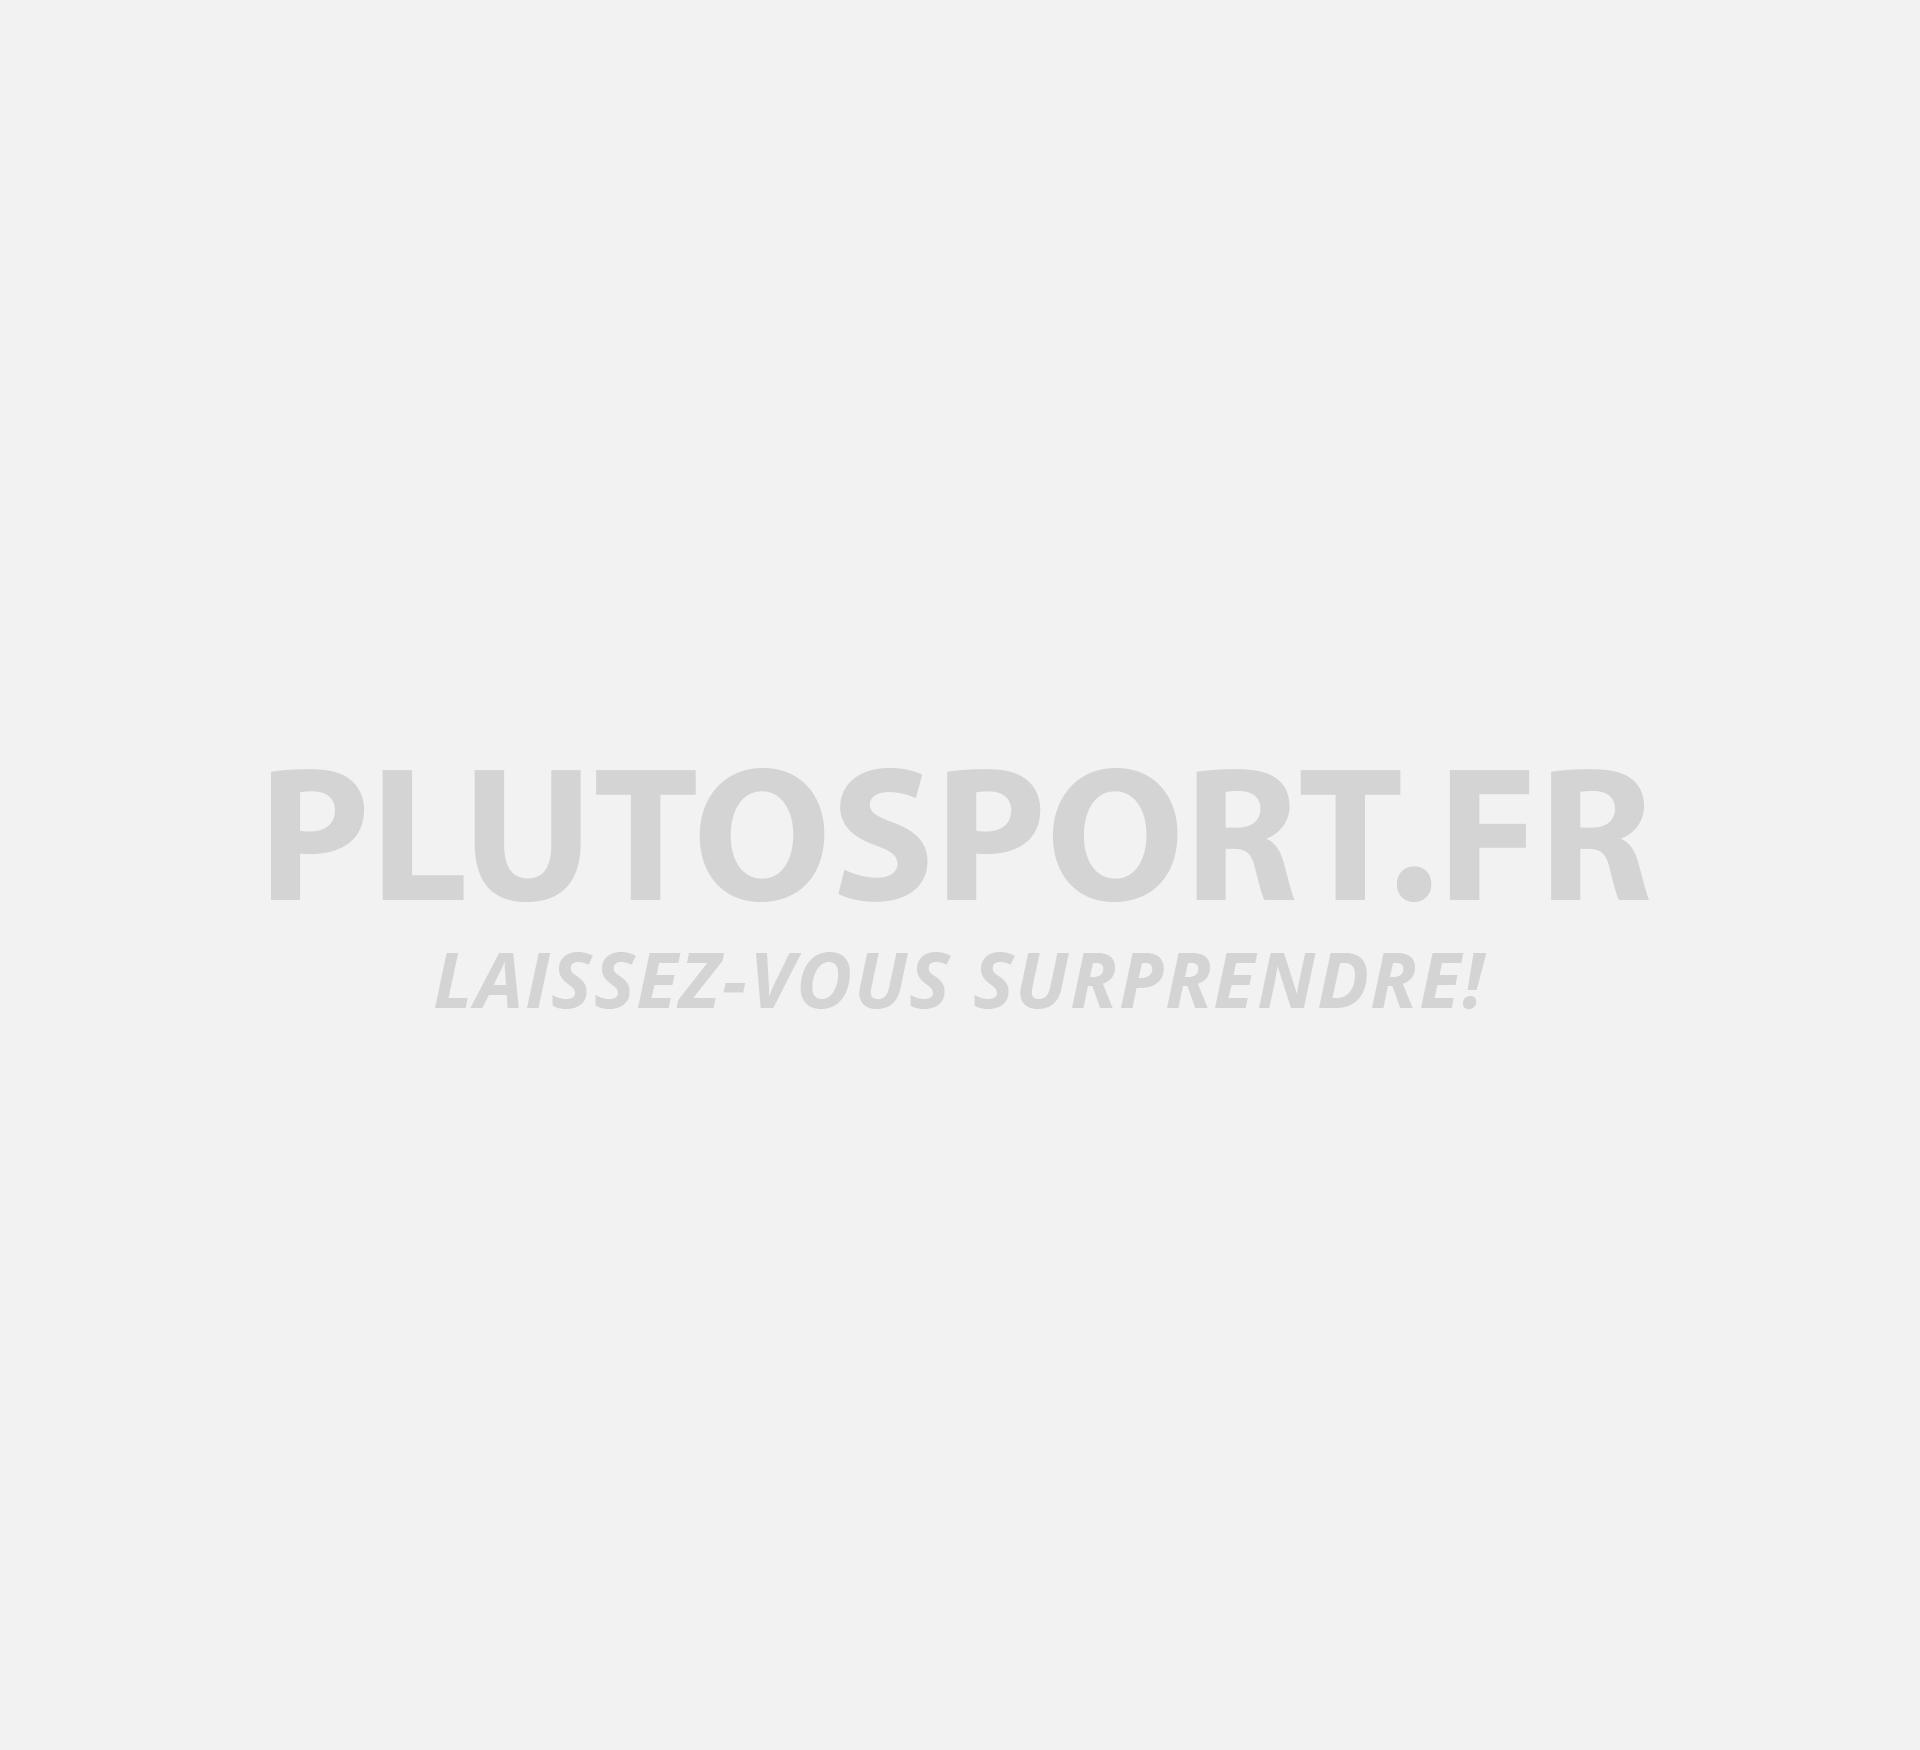 La chaussure de tennis pour femmes K-Swiss Ultrashot W